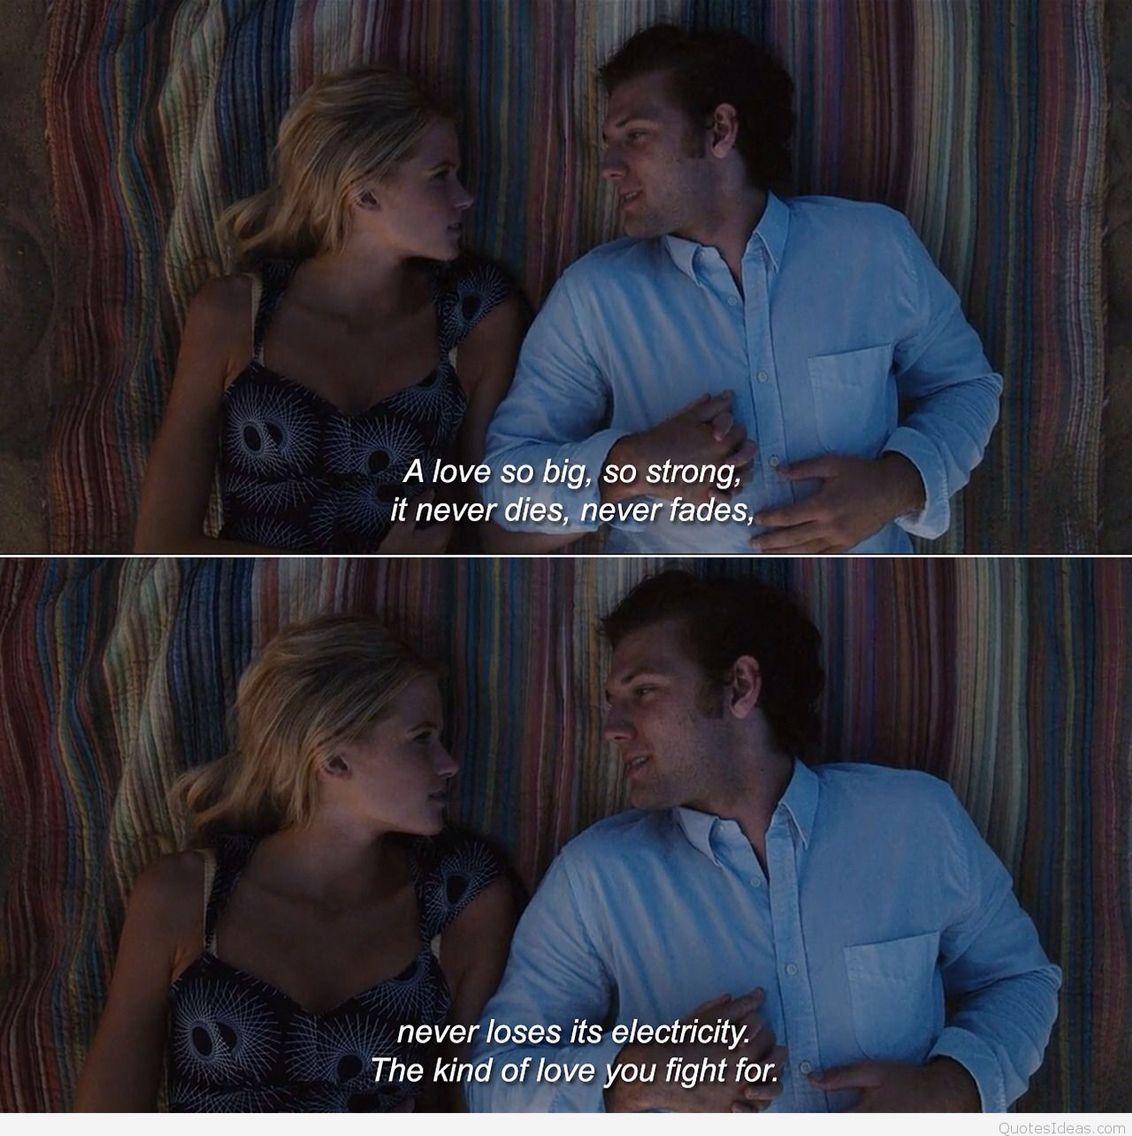 Endless Love Cine Pinterest Peliculas Cine Y Frases